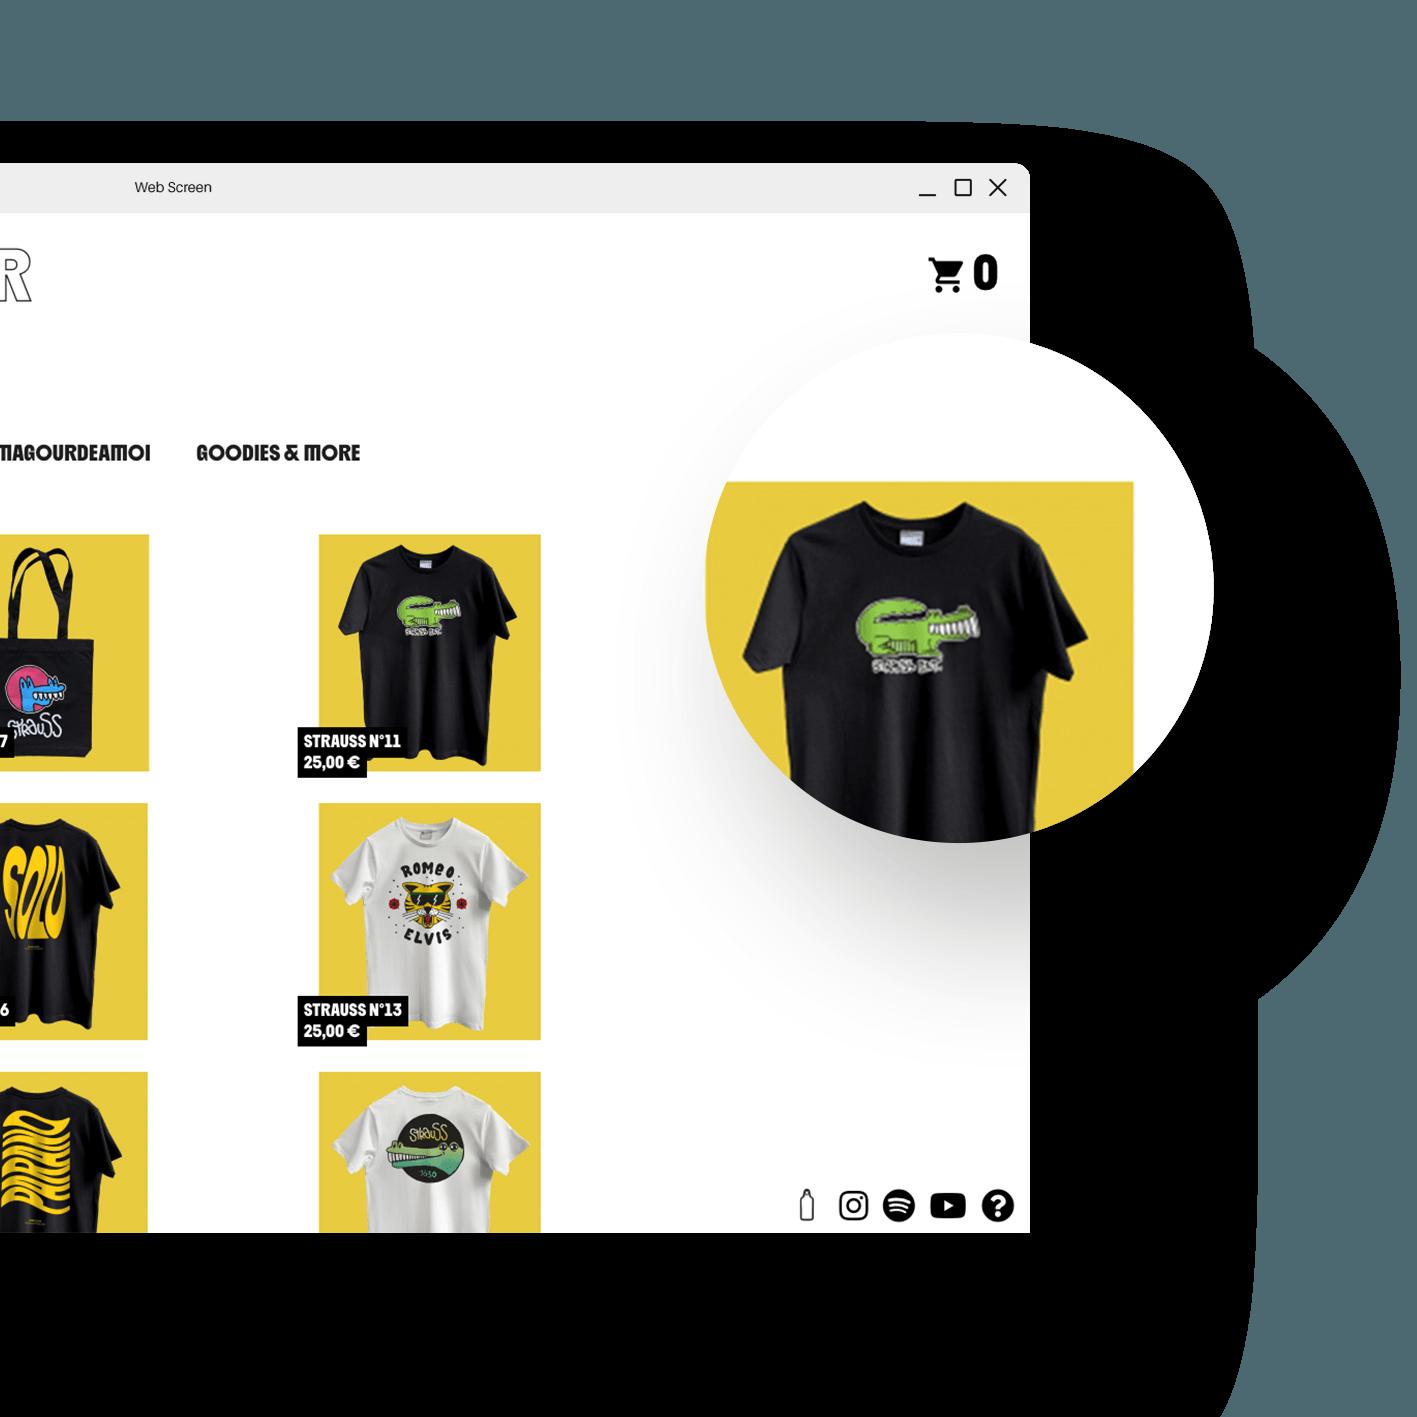 resume-projet-code-express